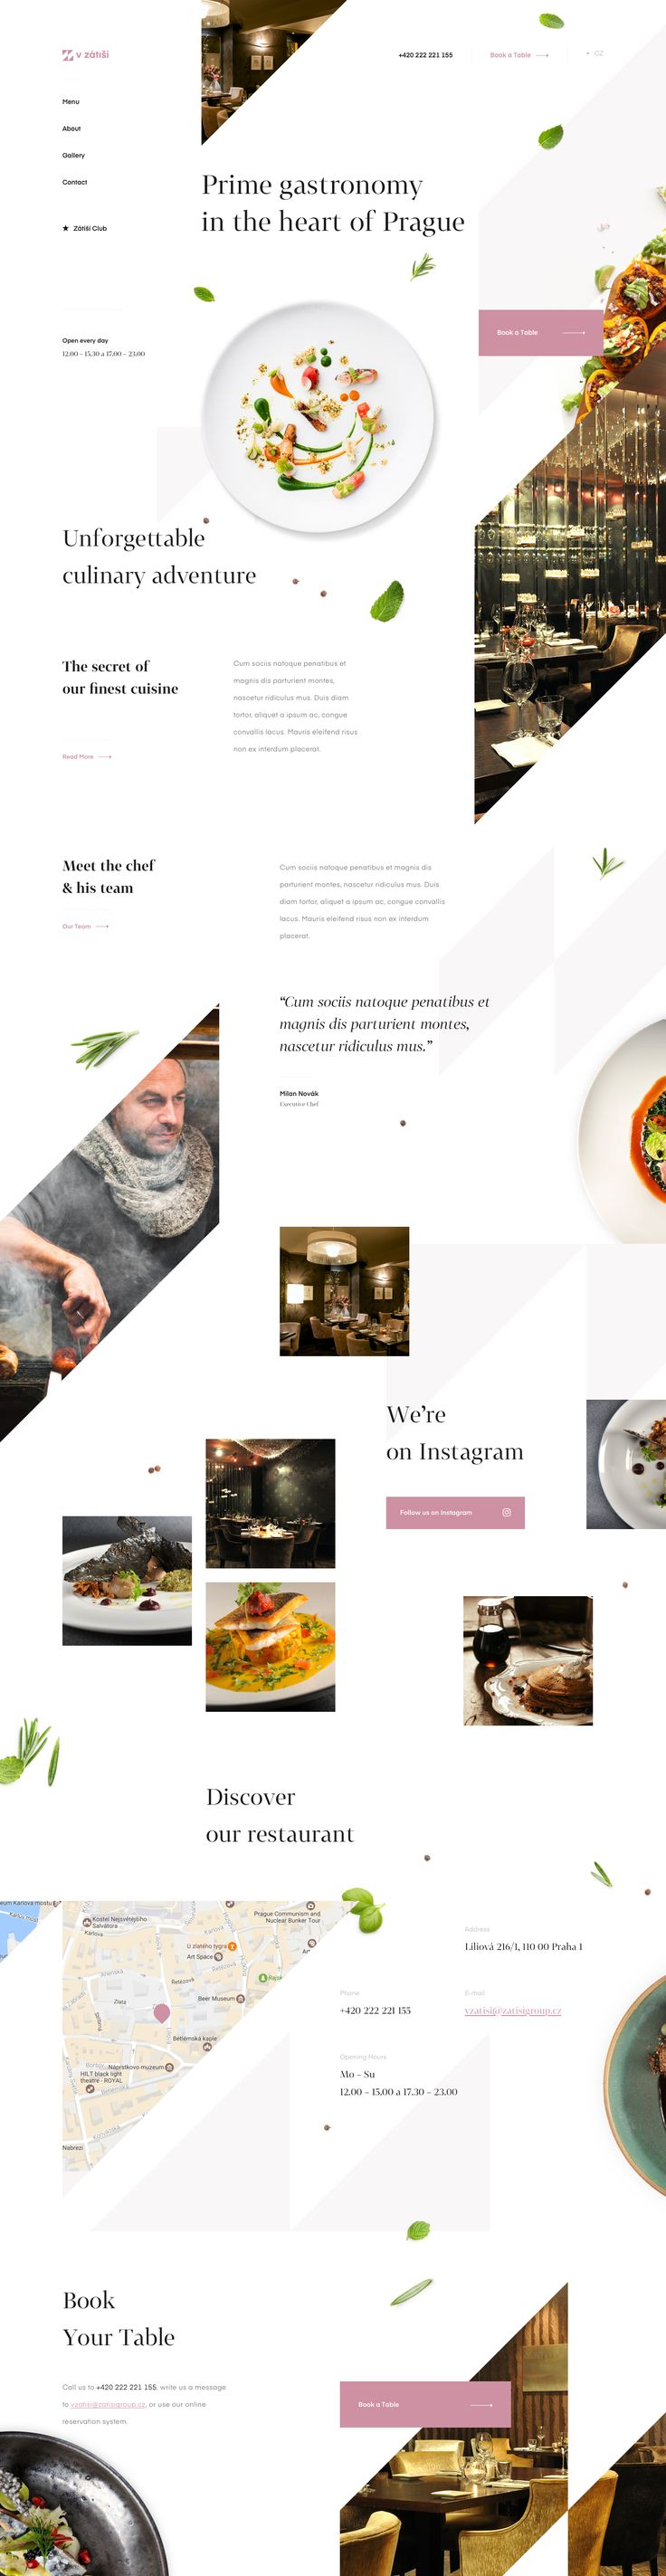 homepage_preview - Restaurant website inspiration